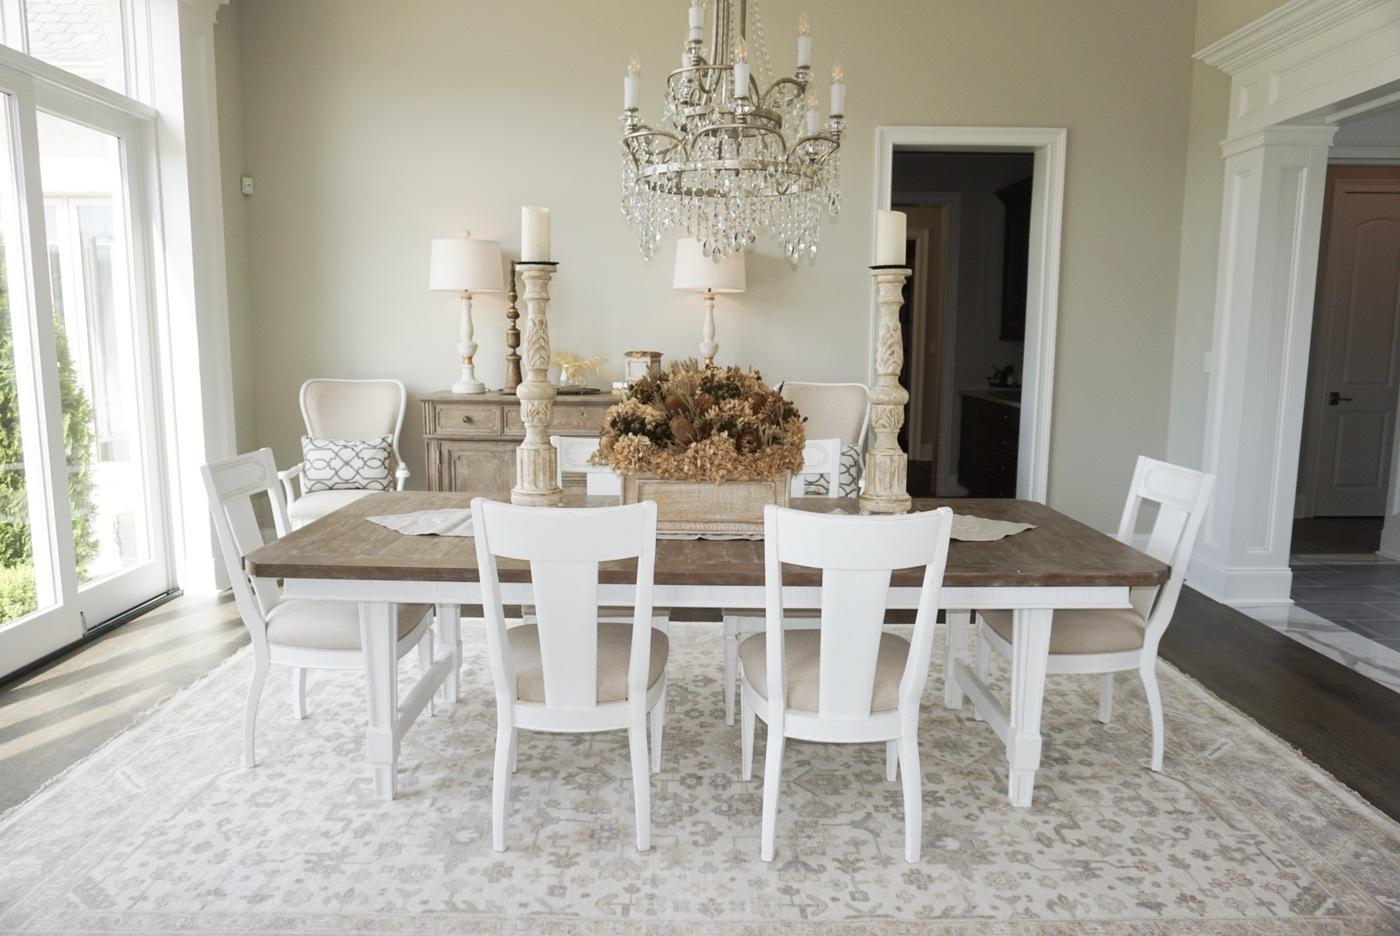 Top Interior Designers in Tuscaloosa dinning room